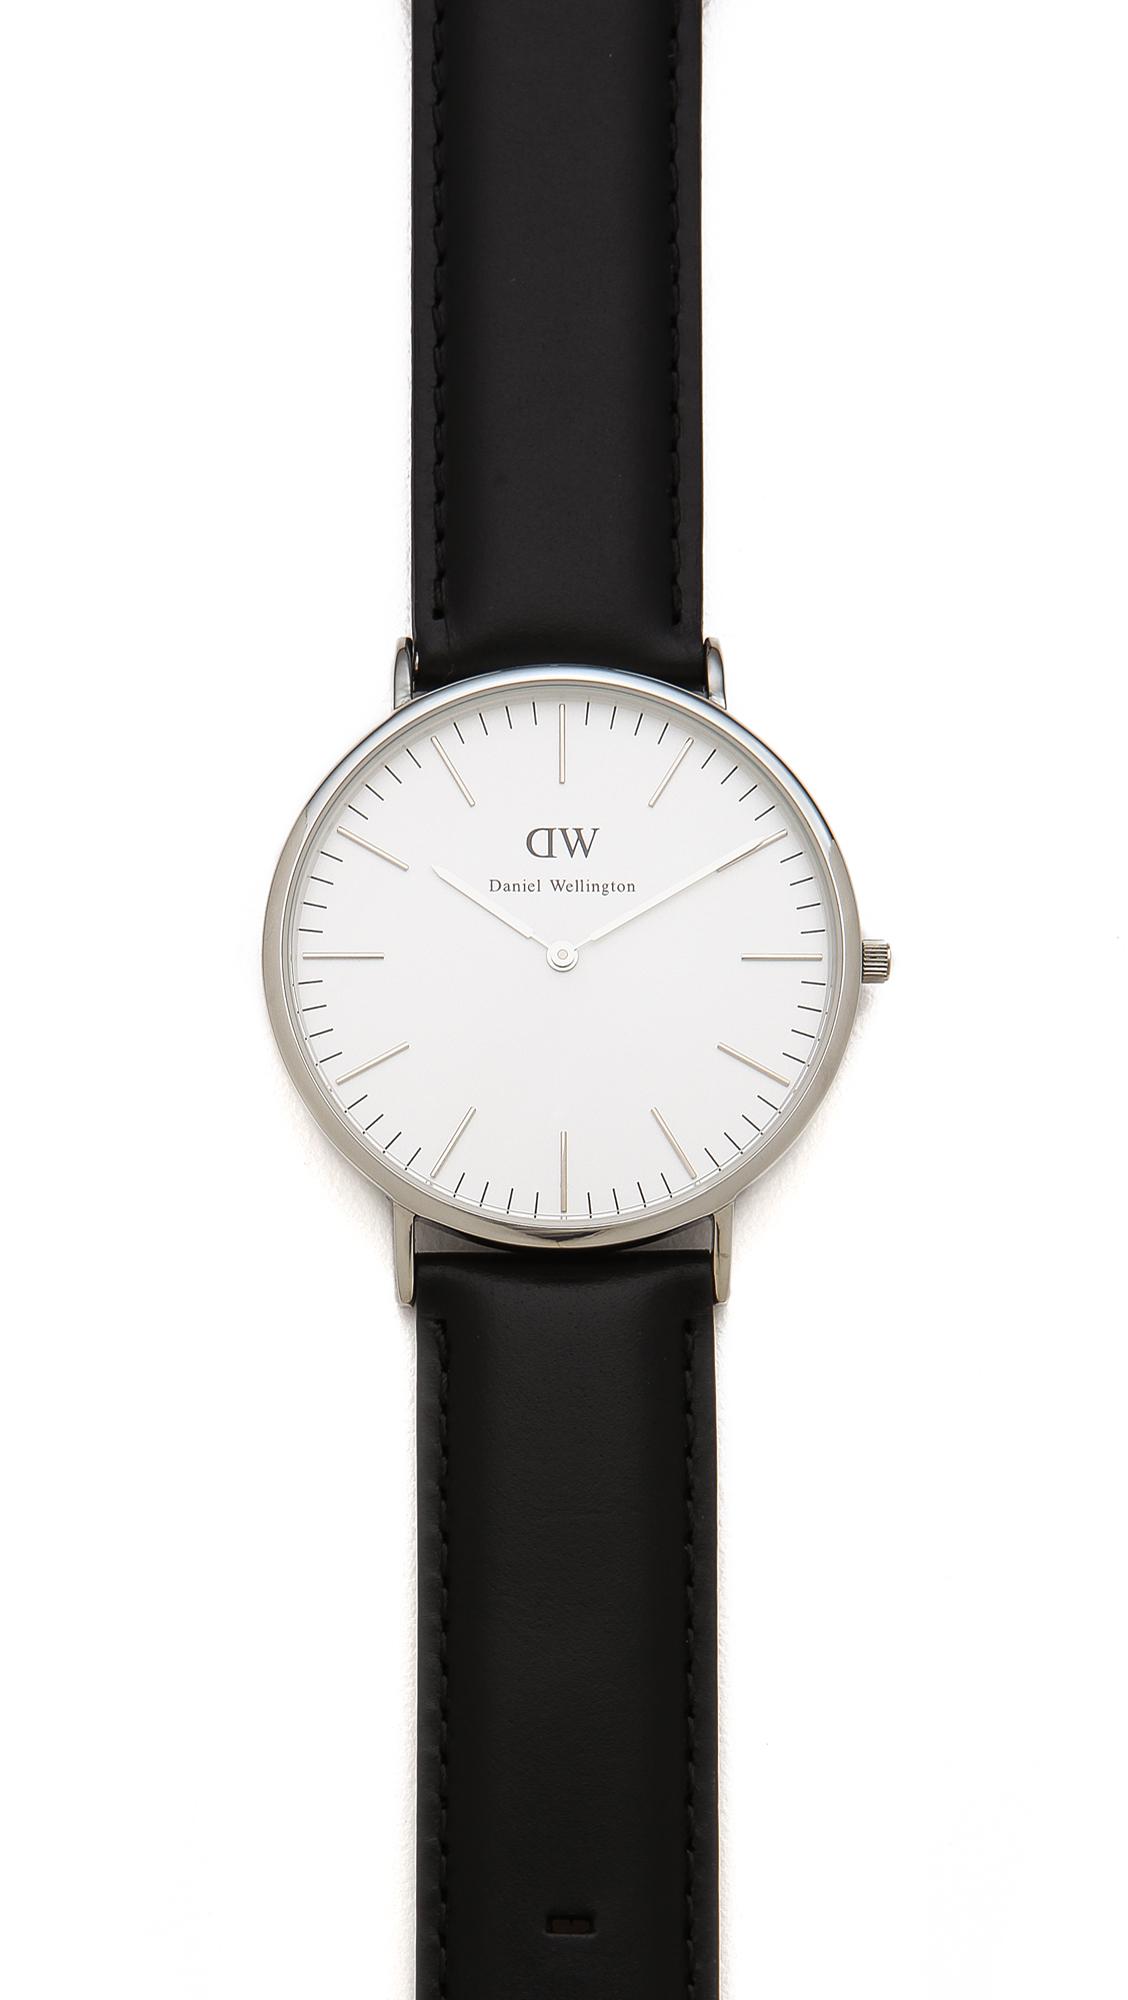 daniel wellington sheffield 40mm watch with black leather. Black Bedroom Furniture Sets. Home Design Ideas